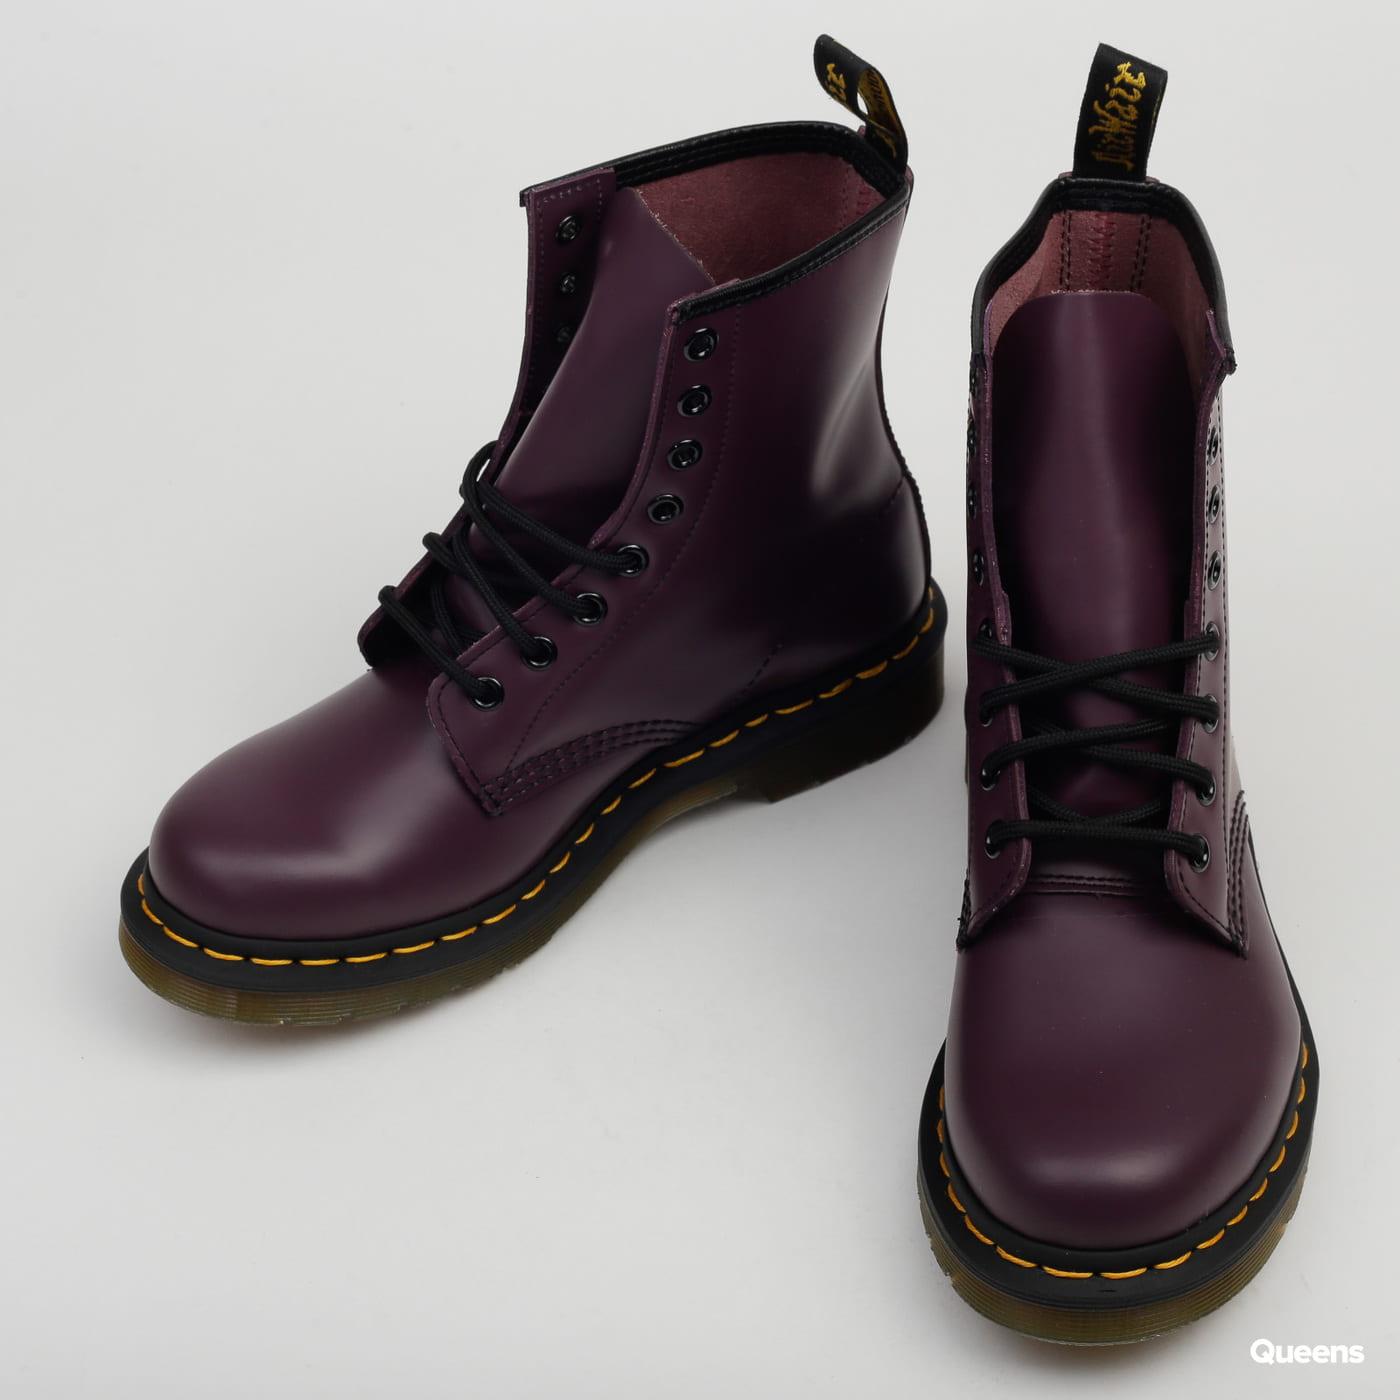 Dr. Martens 1460 W purple smooth